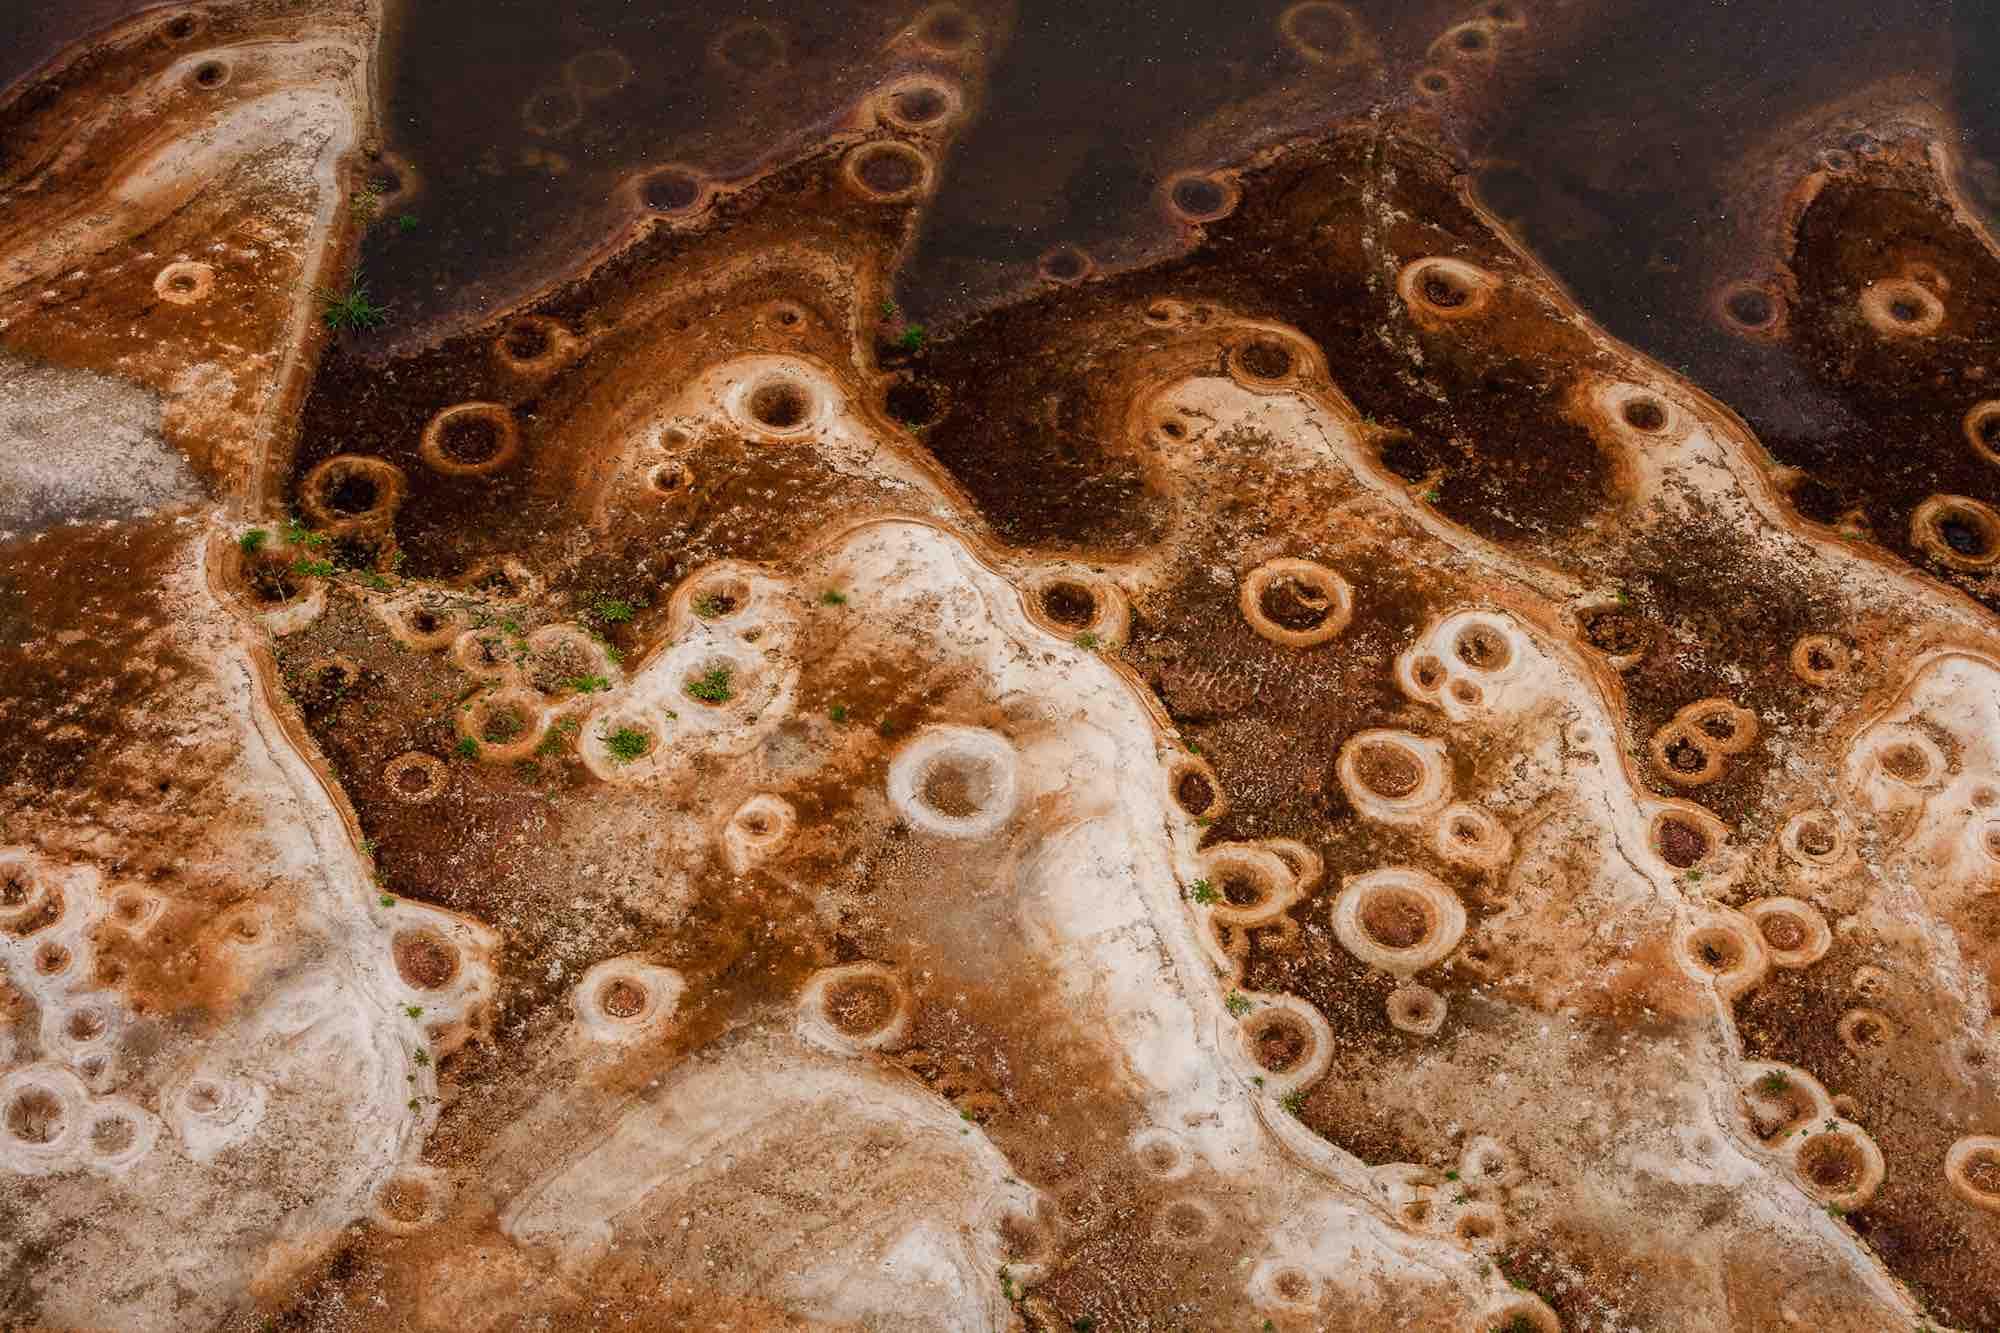 Tilapia nests - Yann Arthus-Bertrand